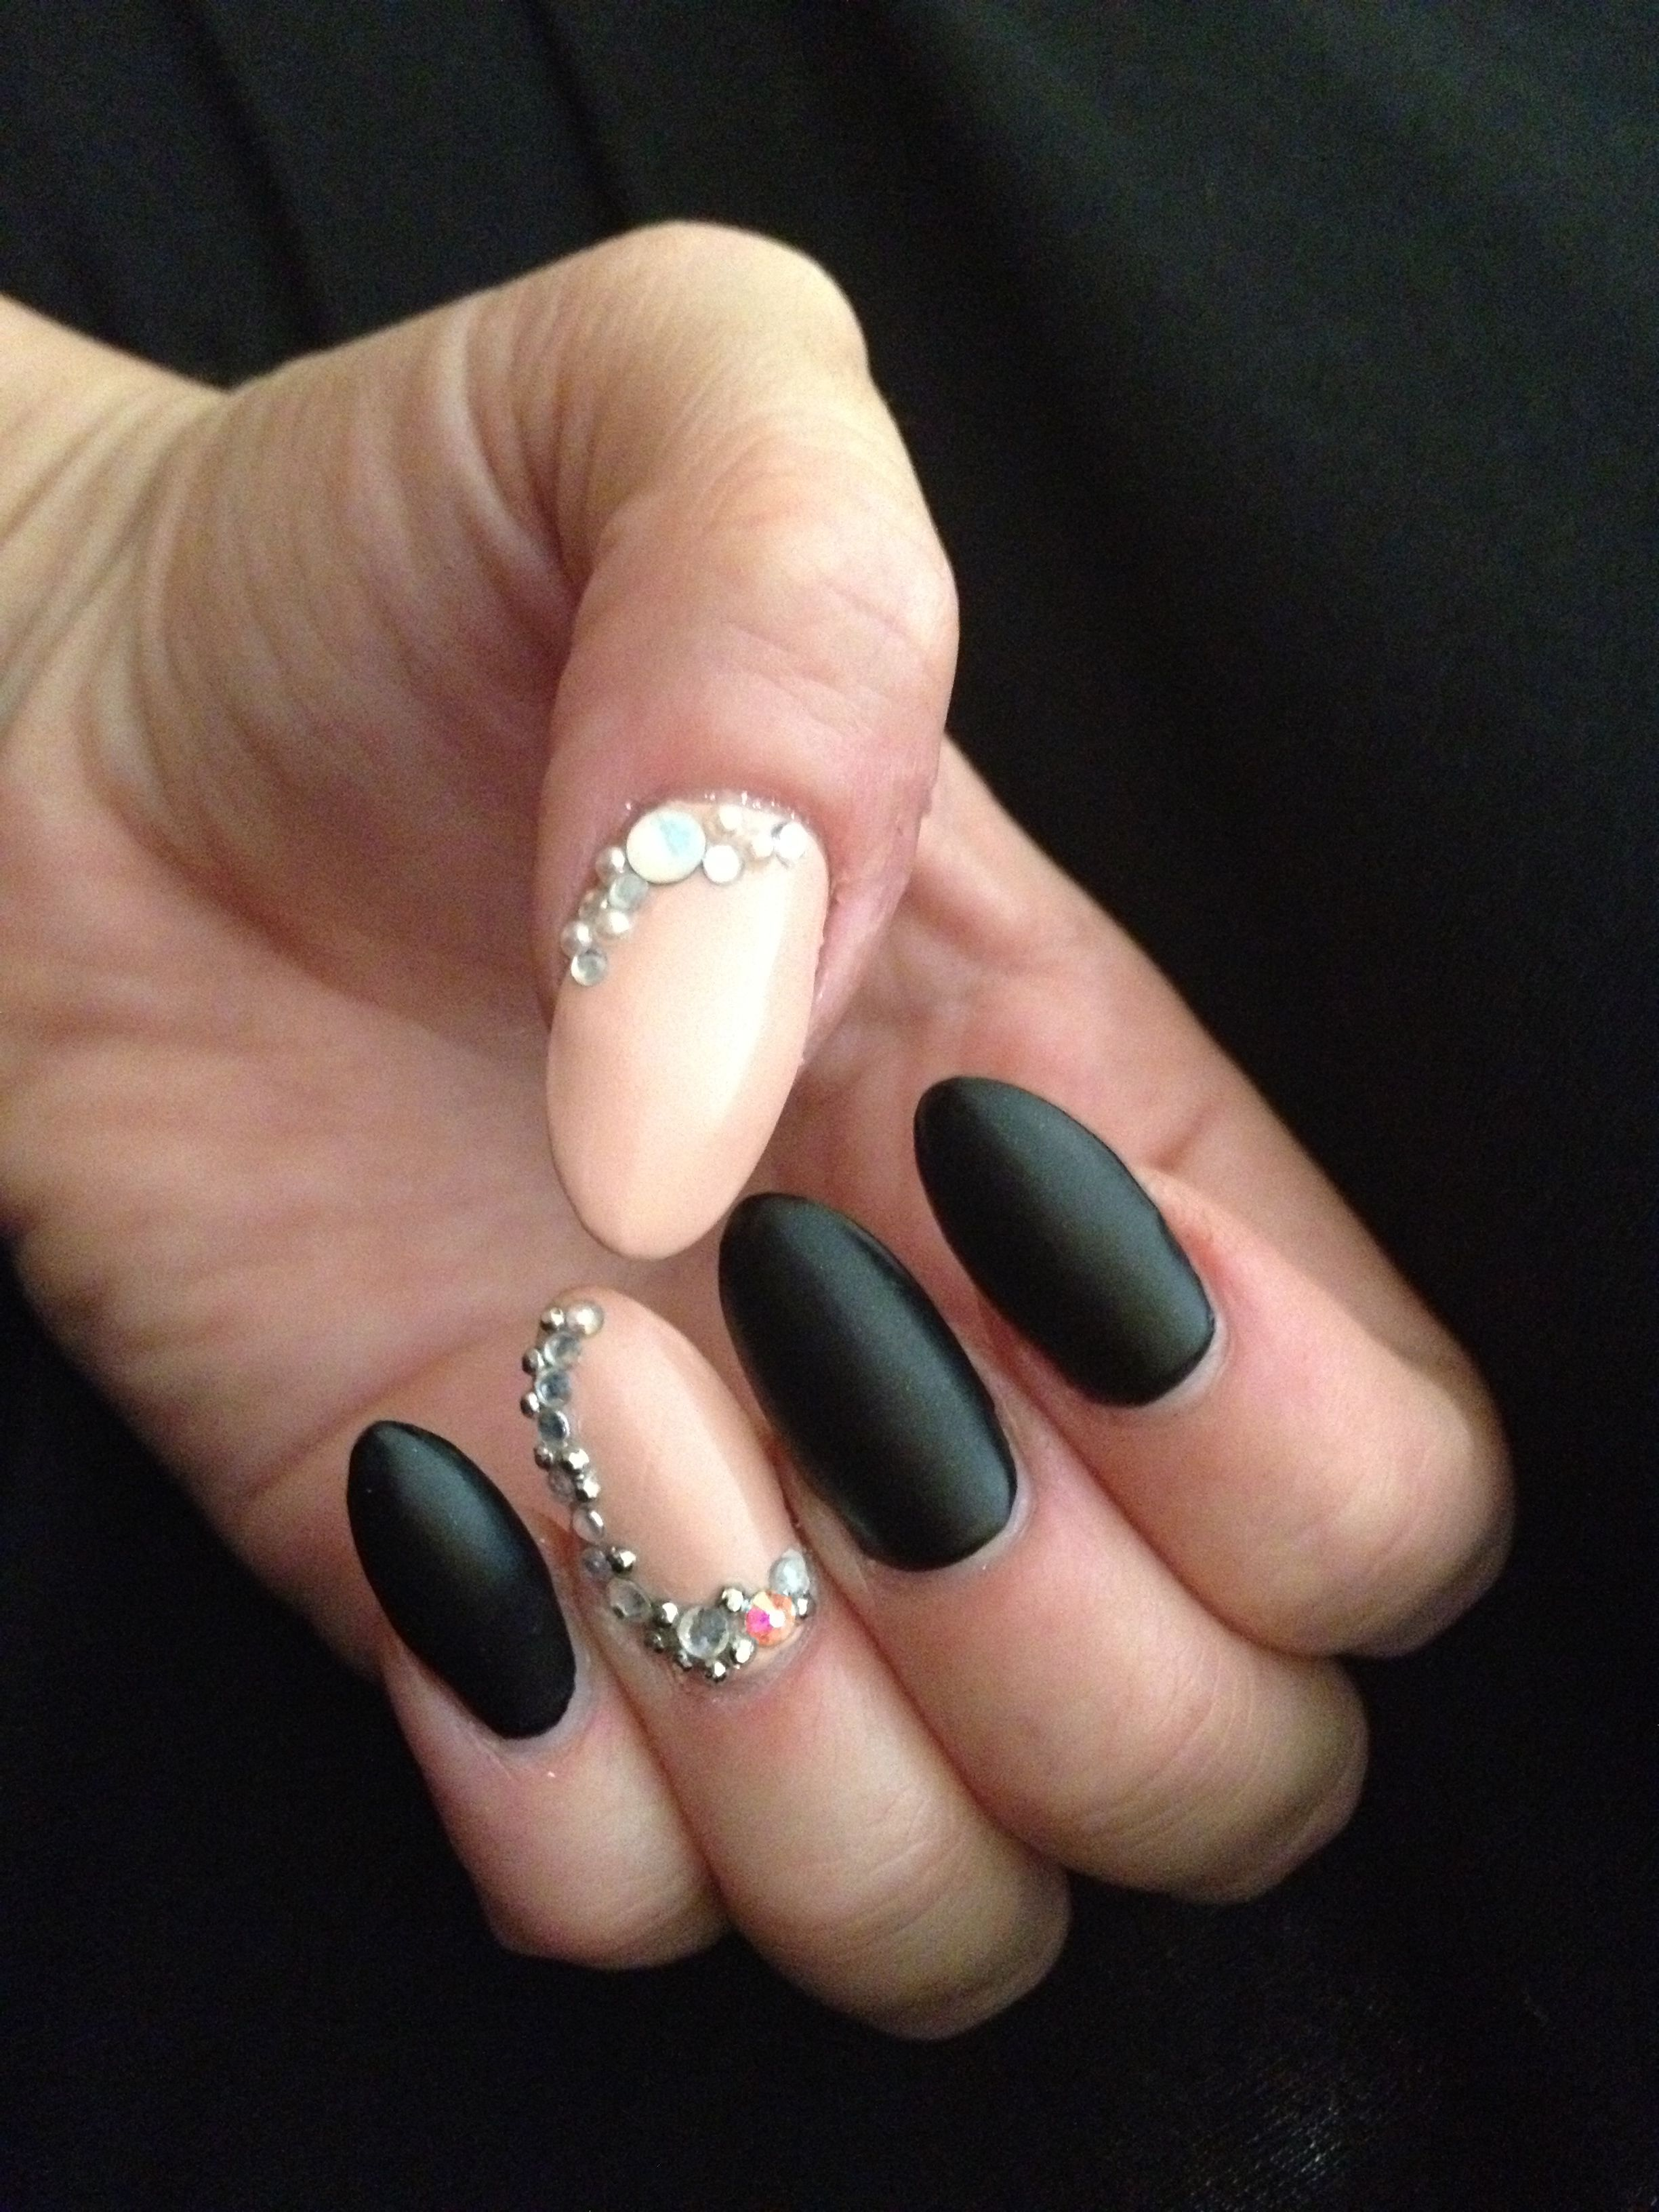 Funky Black Gel Nail Designs Crest - Nail Art Ideas - morihati.com